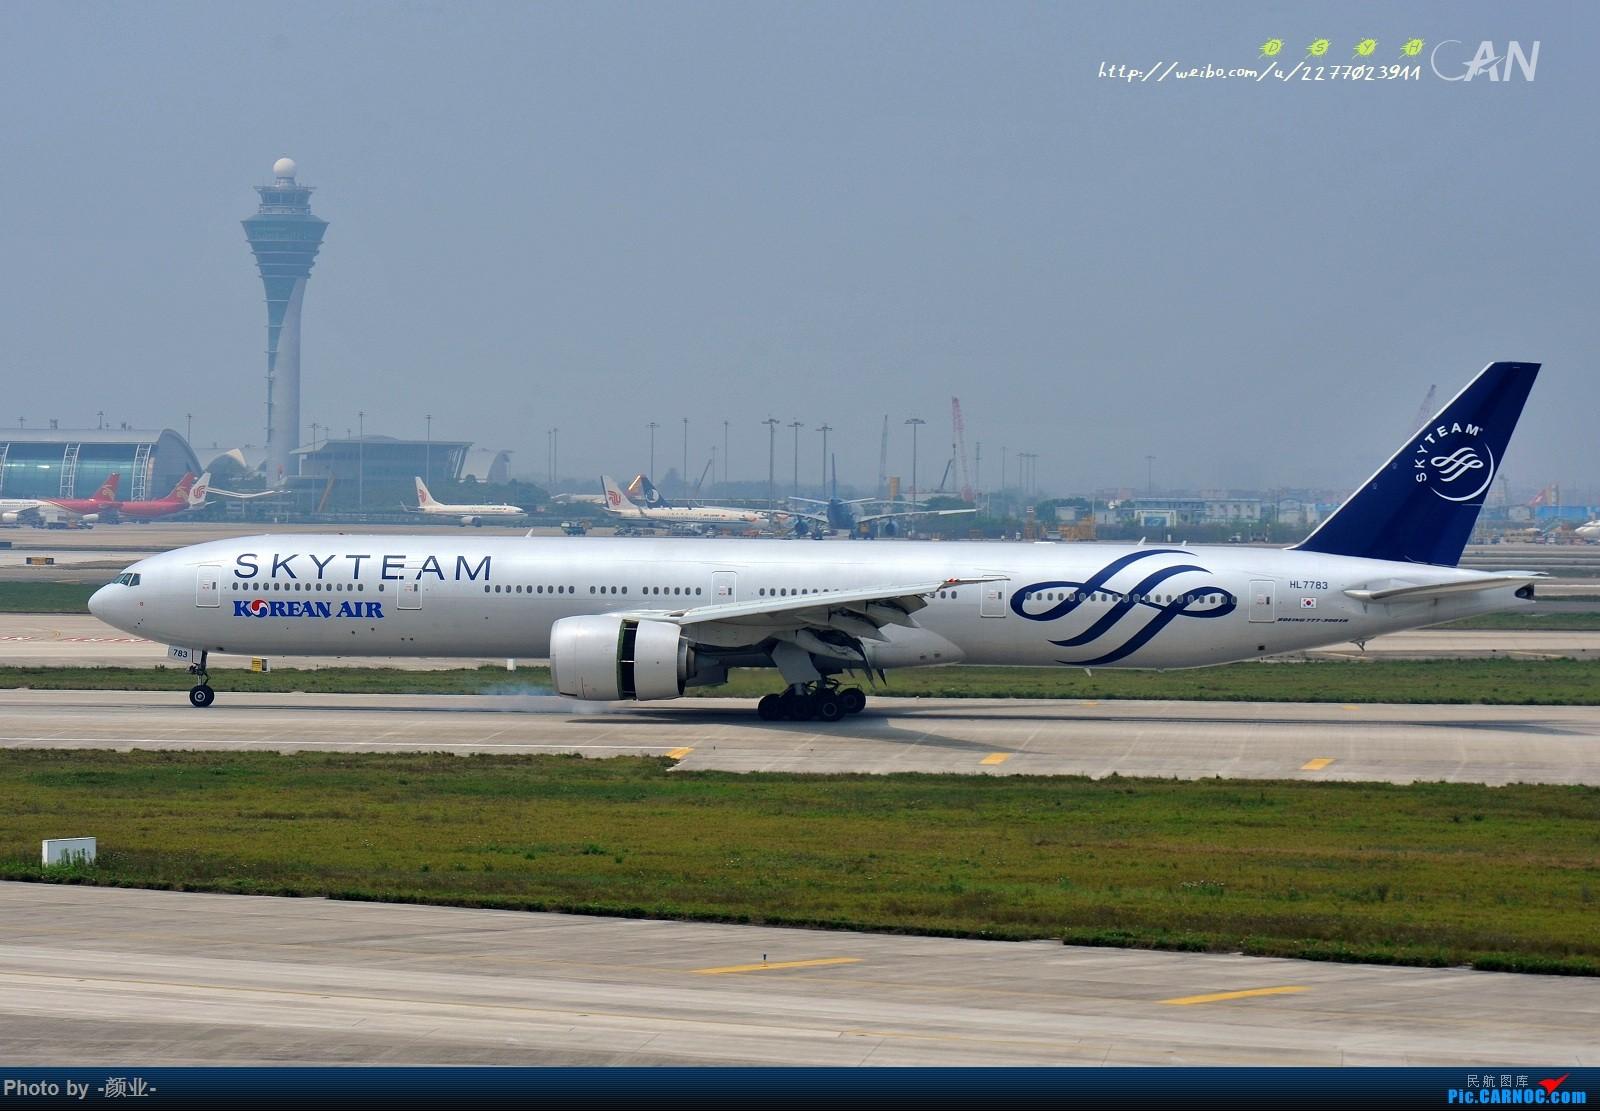 Re:[原创]ZGGG(广州CAN)的波音777系列-继续更新 BOEING 757-300 HL-7783 中国广州白云国际机场